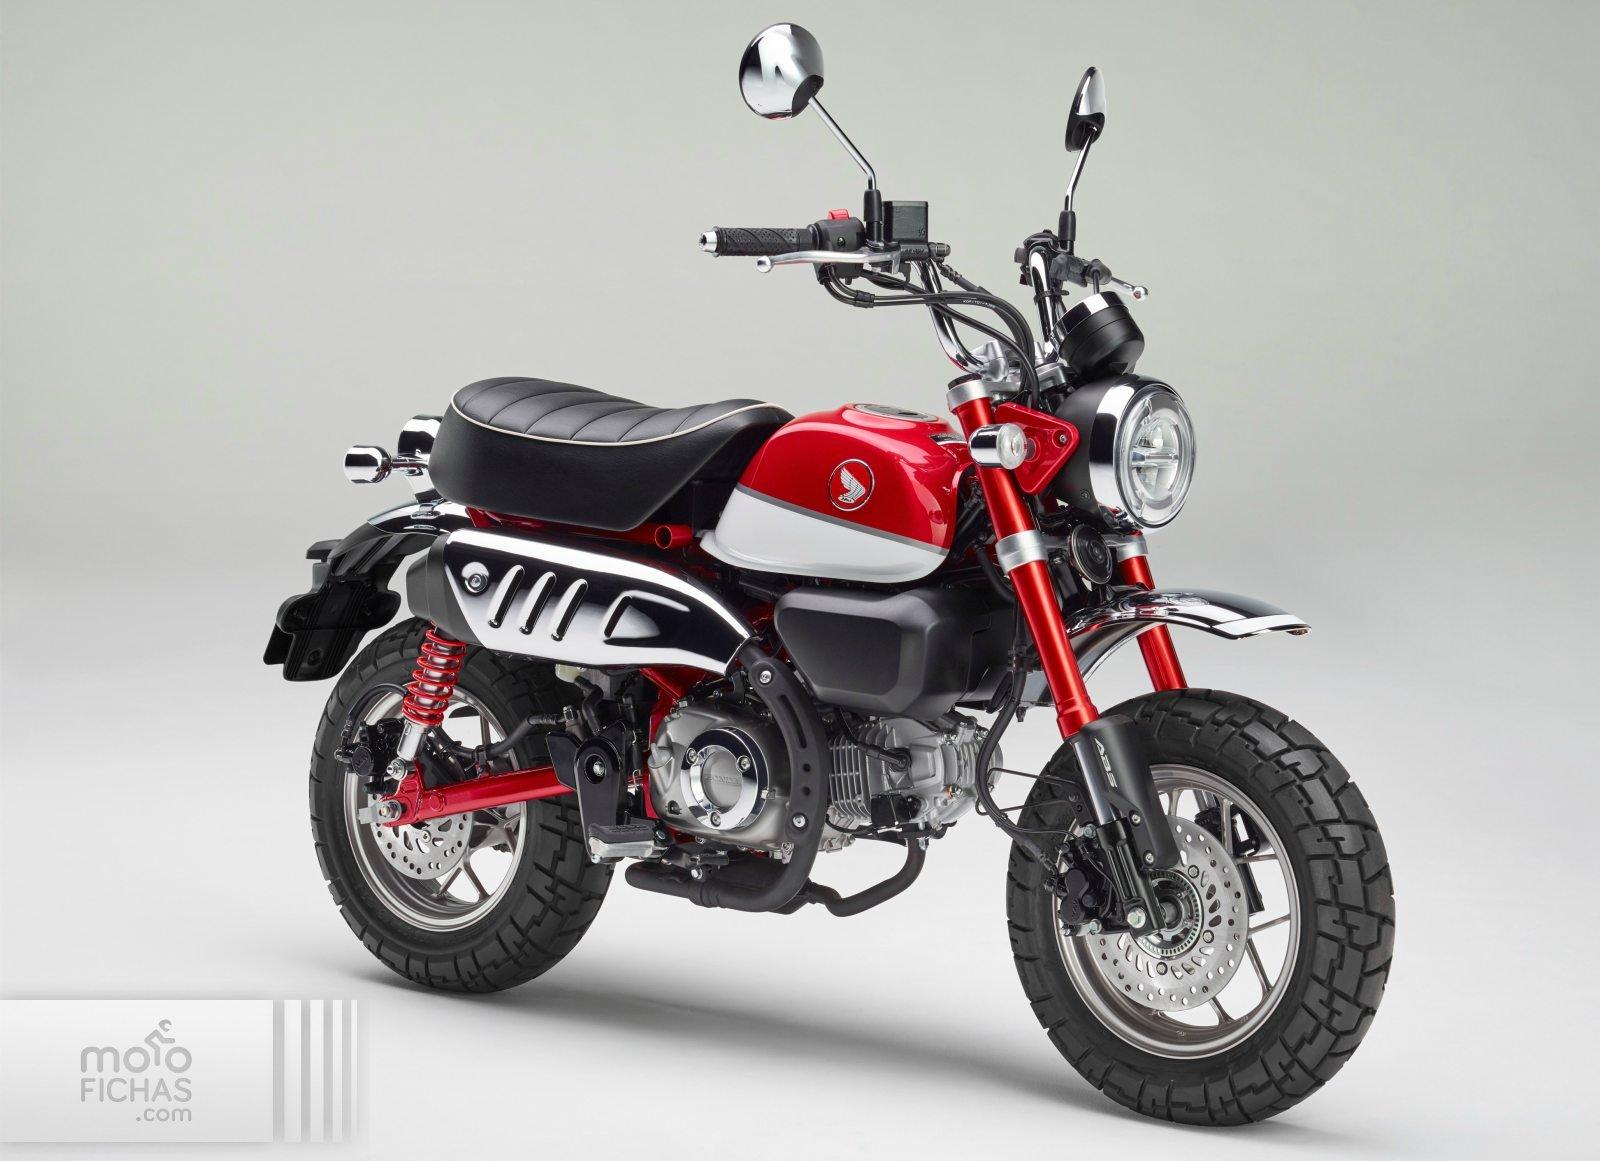 https://www.motofichas.com/images/phocagallery/Honda/monkey-125-2018/01-honda-monkey-125-2018-estatica-rojo.jpg